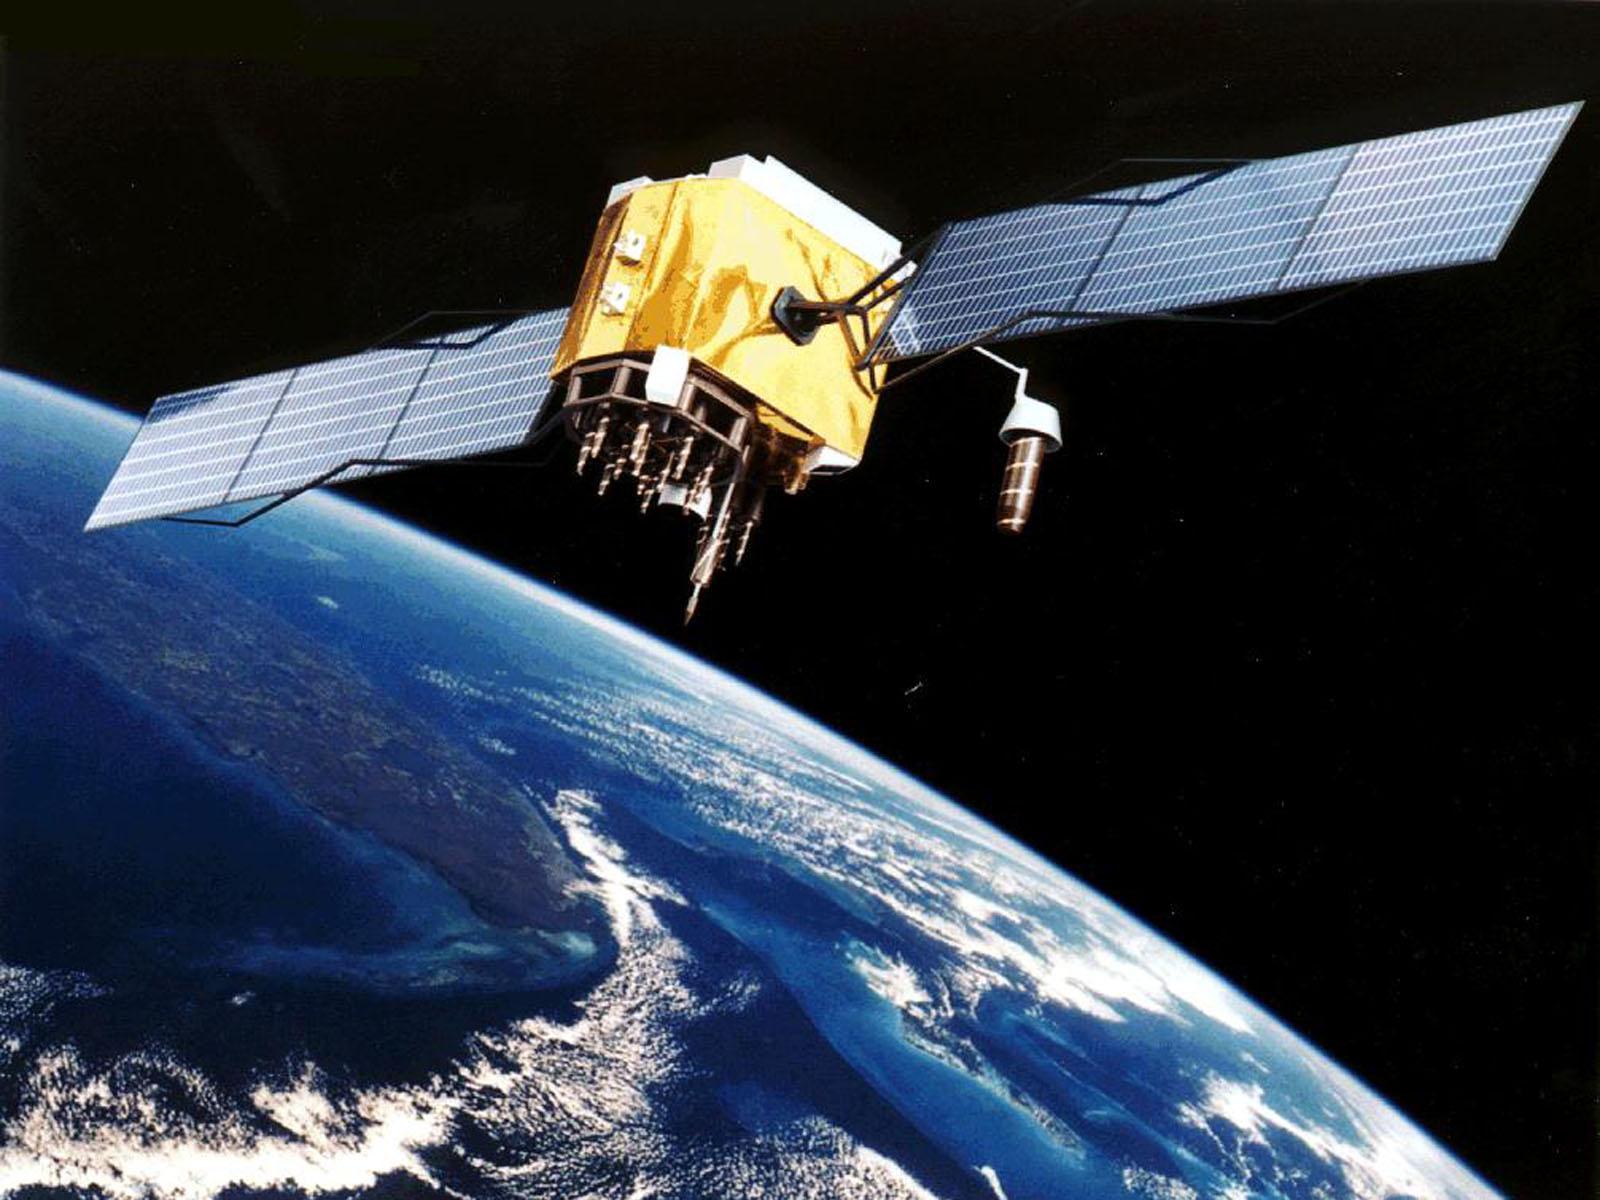 satellite and spacecraft - photo #8